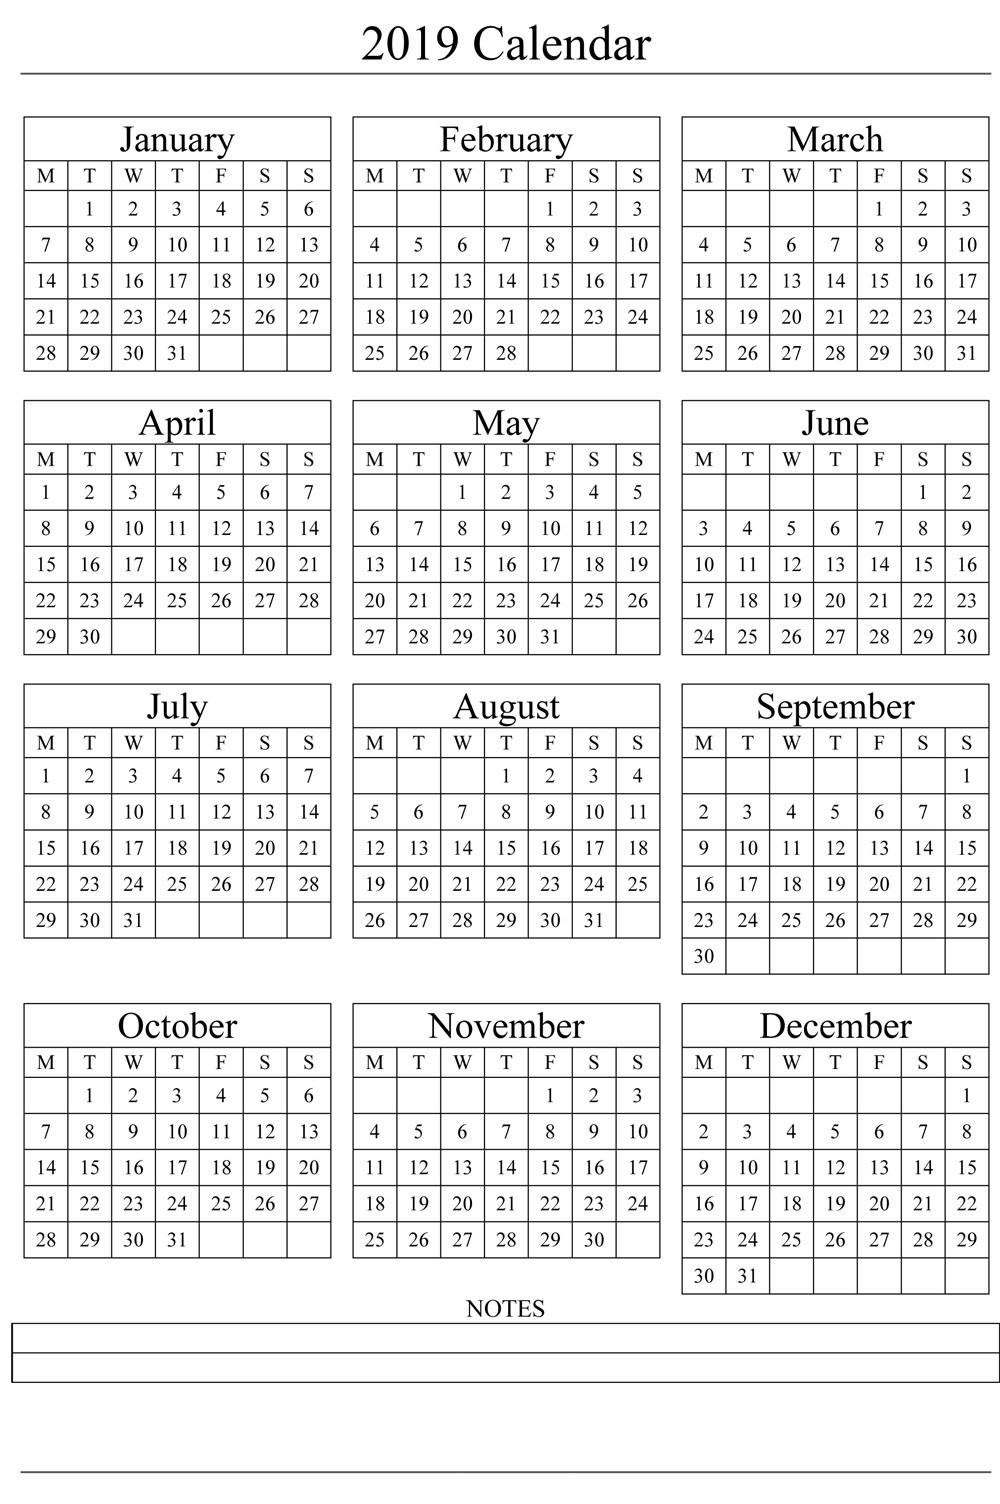 Printable 2019 Calendar 2019 Printable Calendar Templates [free]